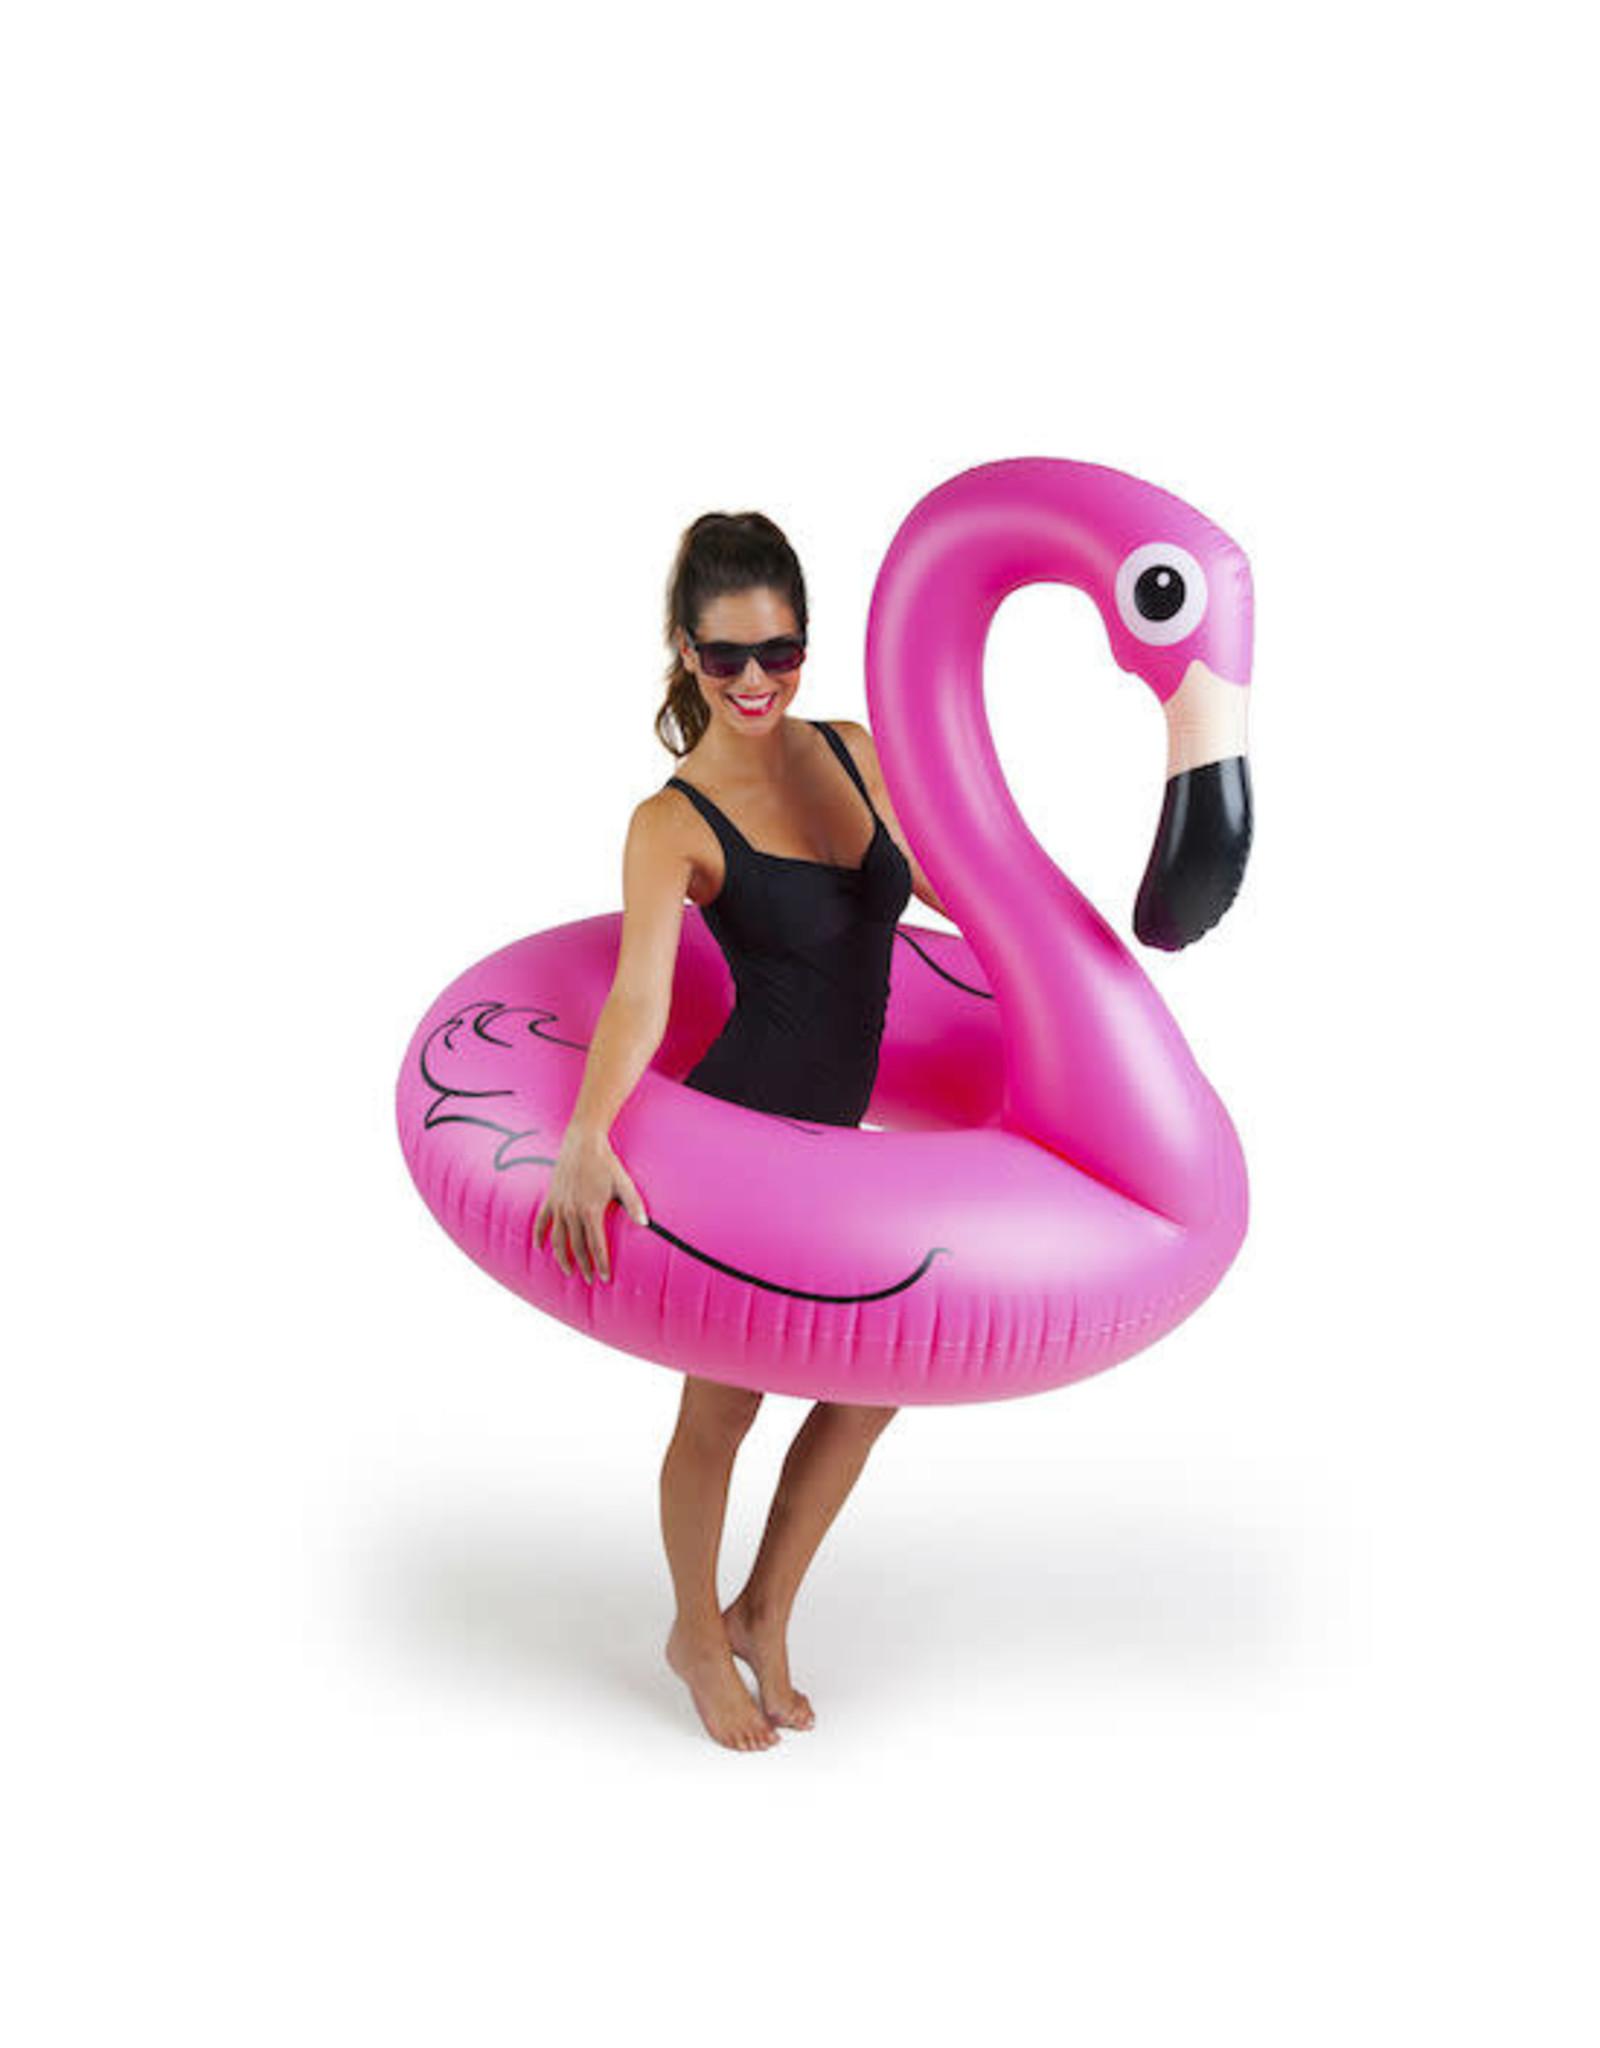 pool float - giant pink flamingo